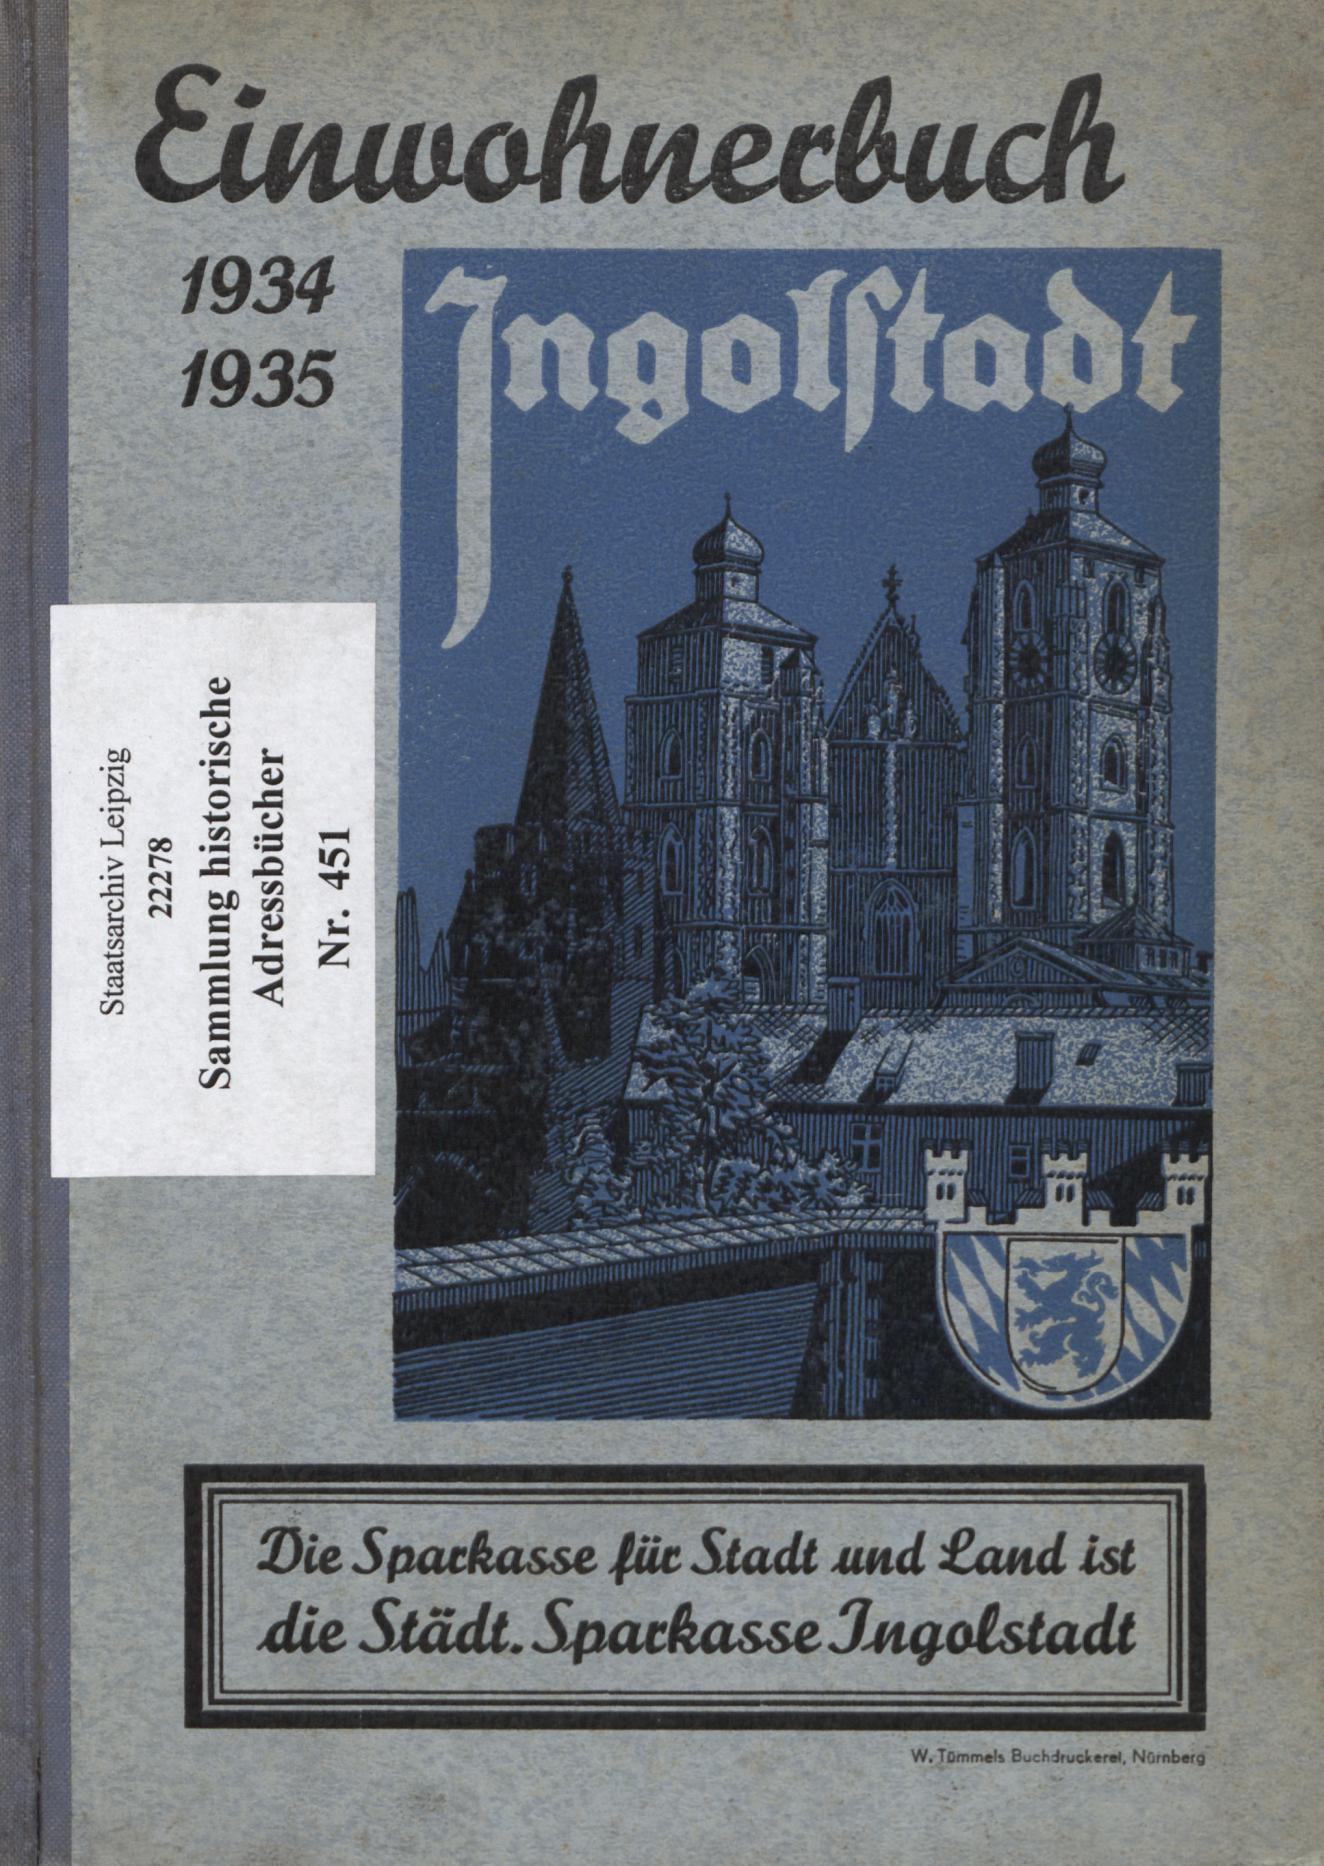 Adressbuch Ingolstadt 1934-35